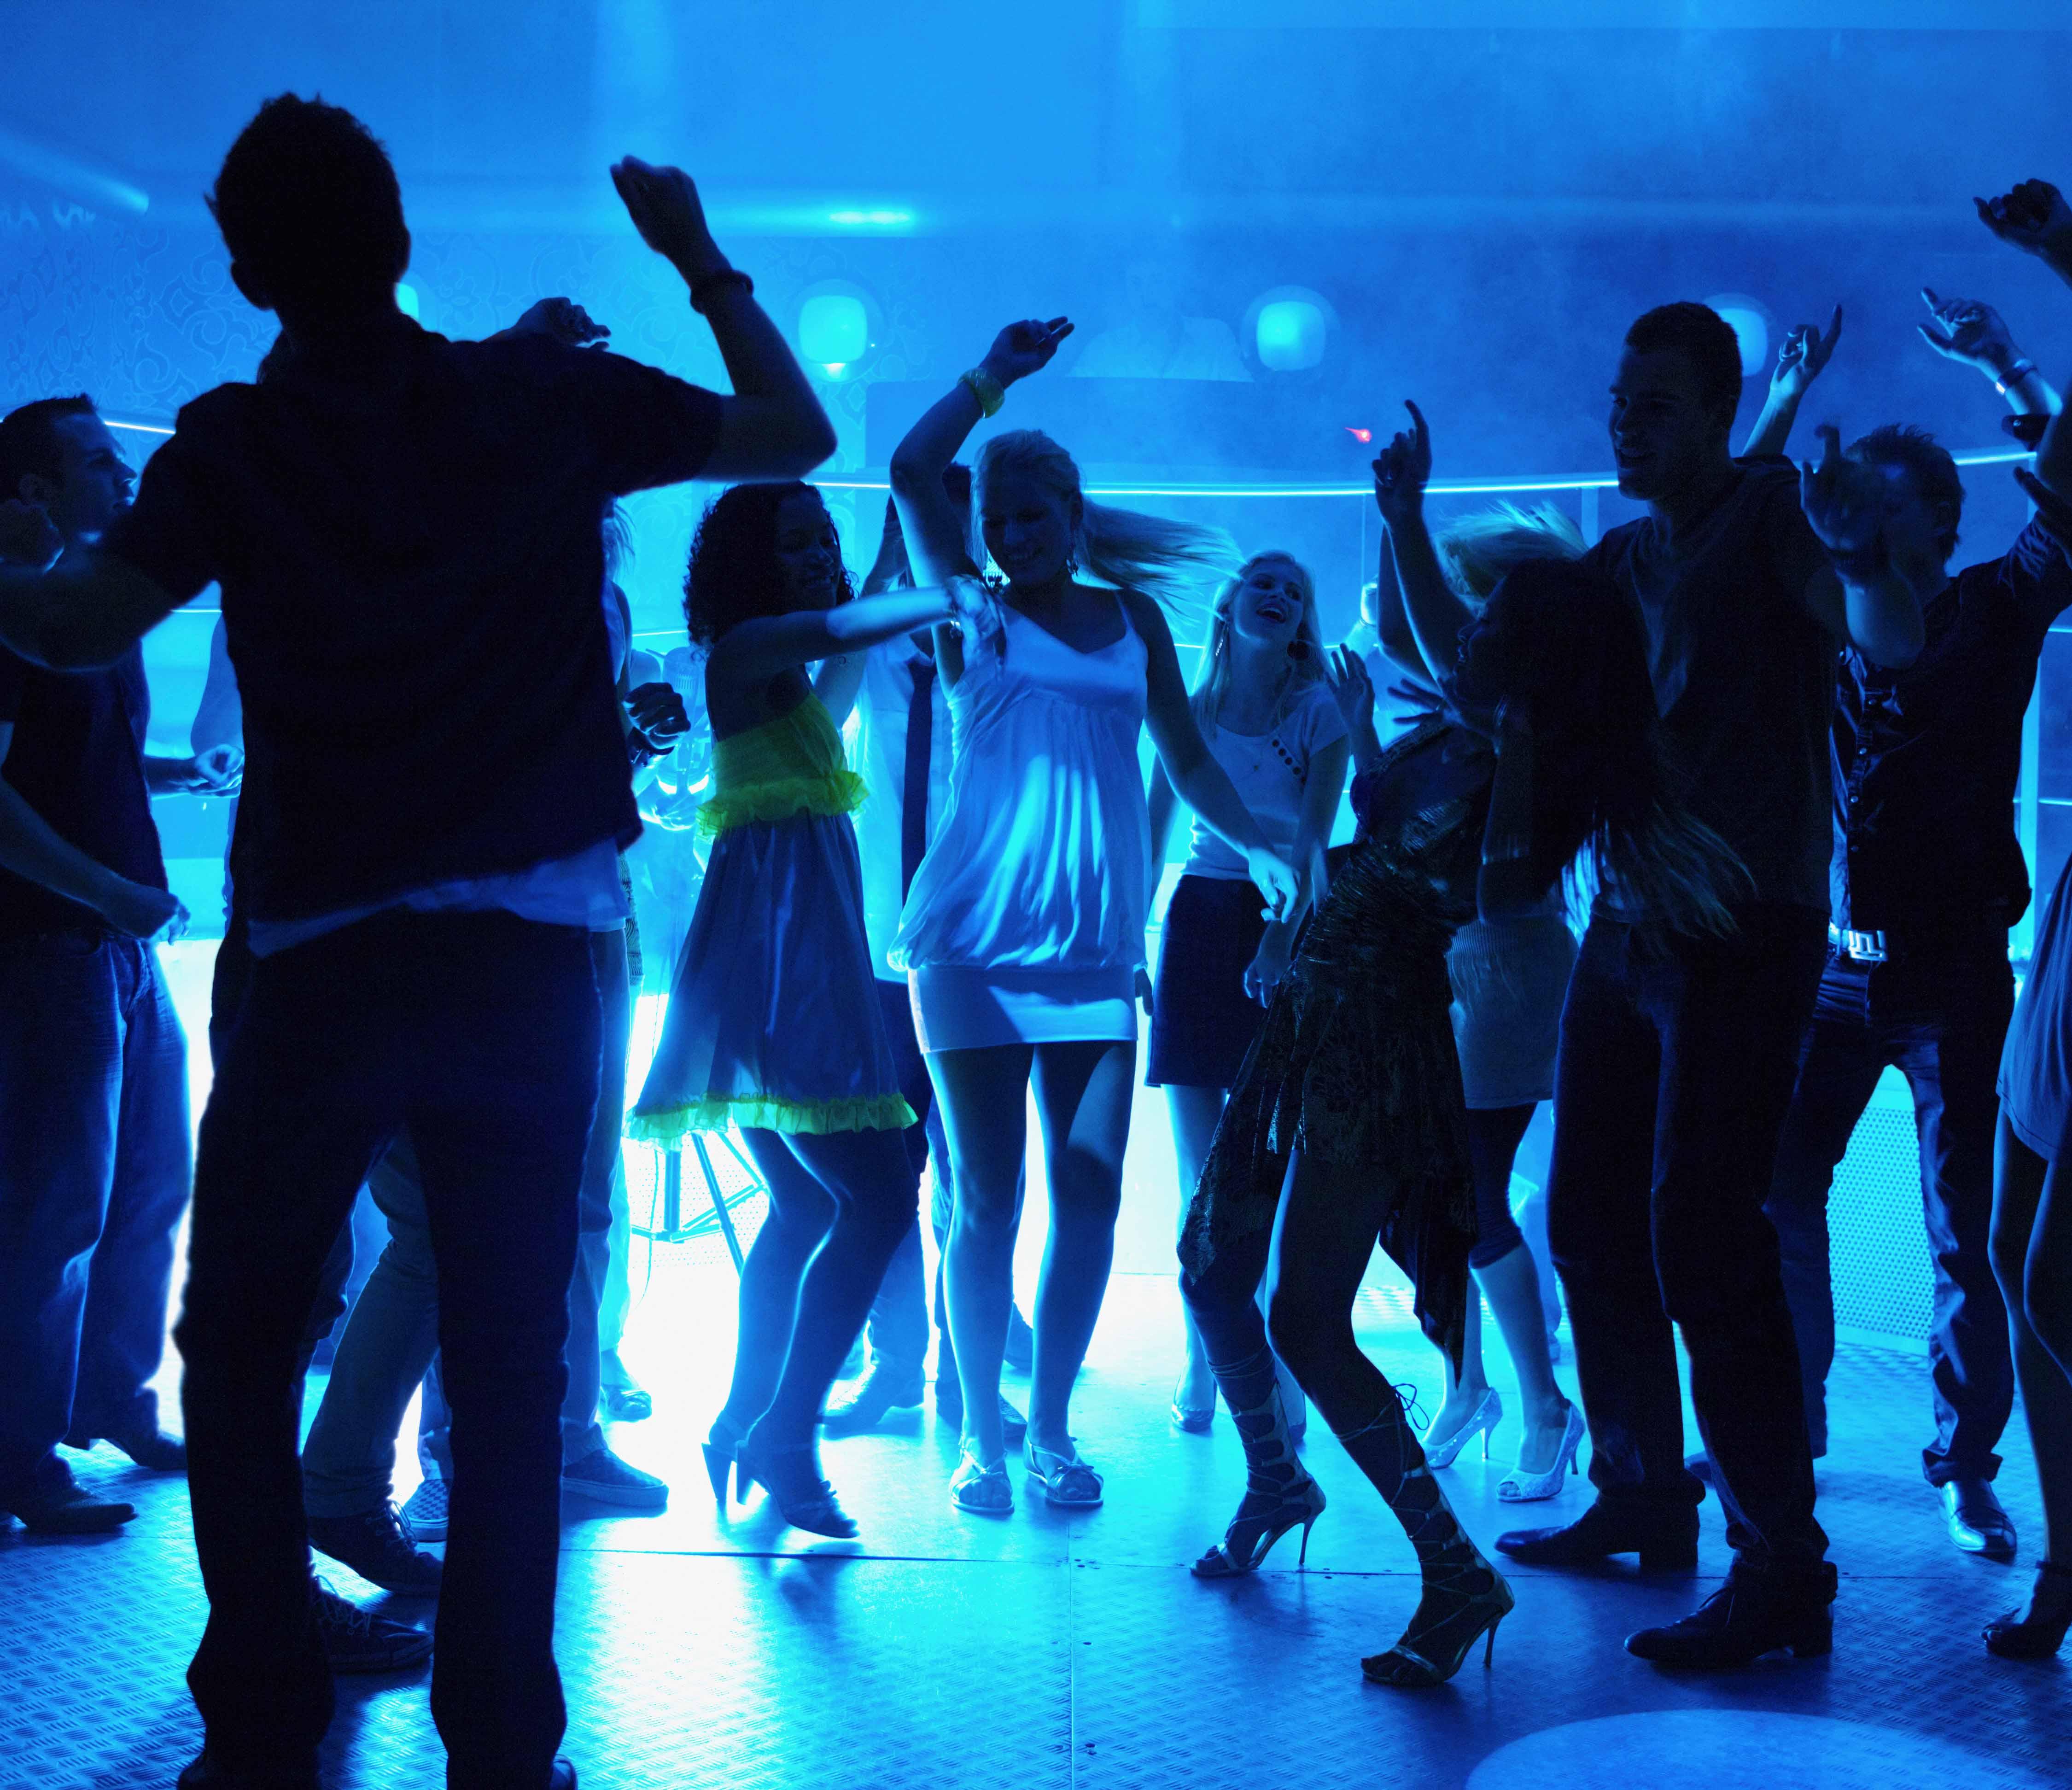 dancing club images - HD1200×864